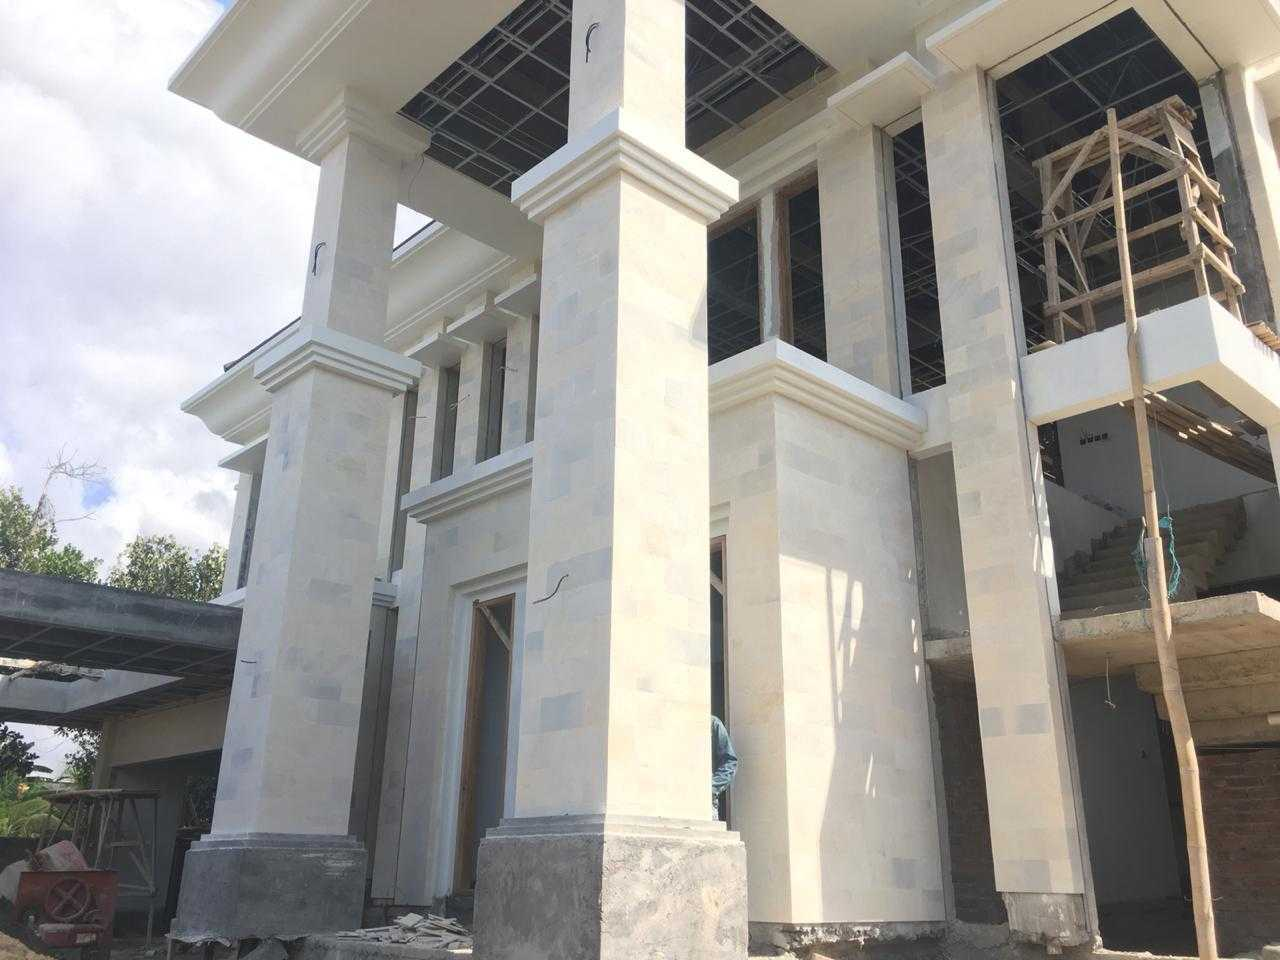 Emporio Architect In Progress Villa Bali Tropis 216  @ Denpasar Kota Denpasar, Bali, Indonesia Kota Denpasar, Bali, Indonesia Emporio-Architect-Progress-Villa-Bali-Tropis-216-Denpasar Tropical 75650